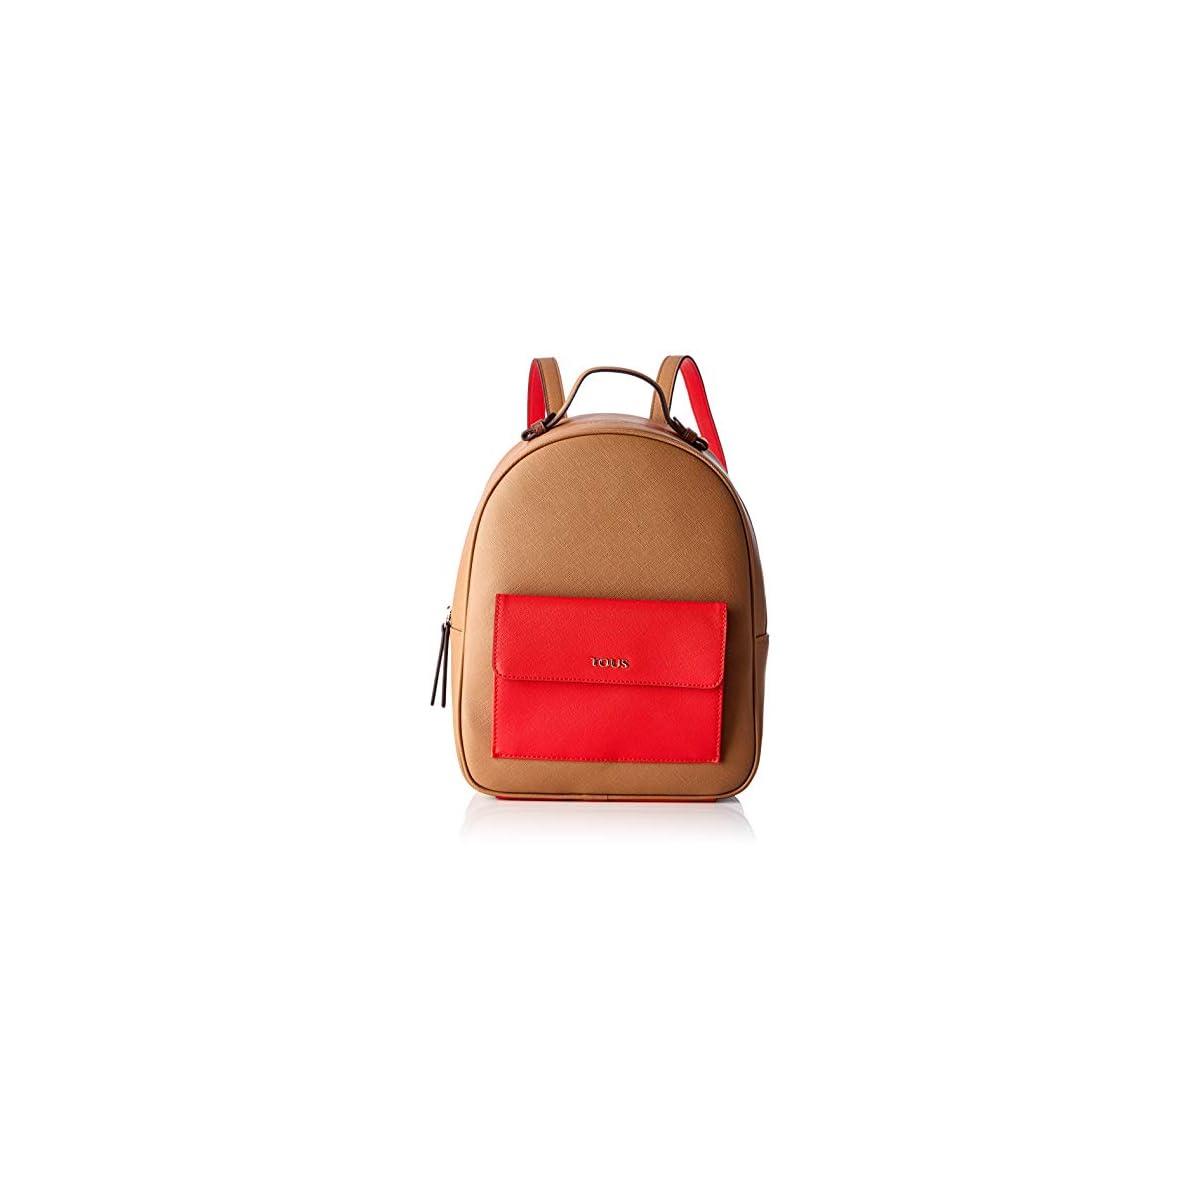 41PLgRO2ReL. SS1200  - Tous Mochila Essence MARRÓN-Rojo, Bolso Mujer, 25x31x12 cm (W x H x L)